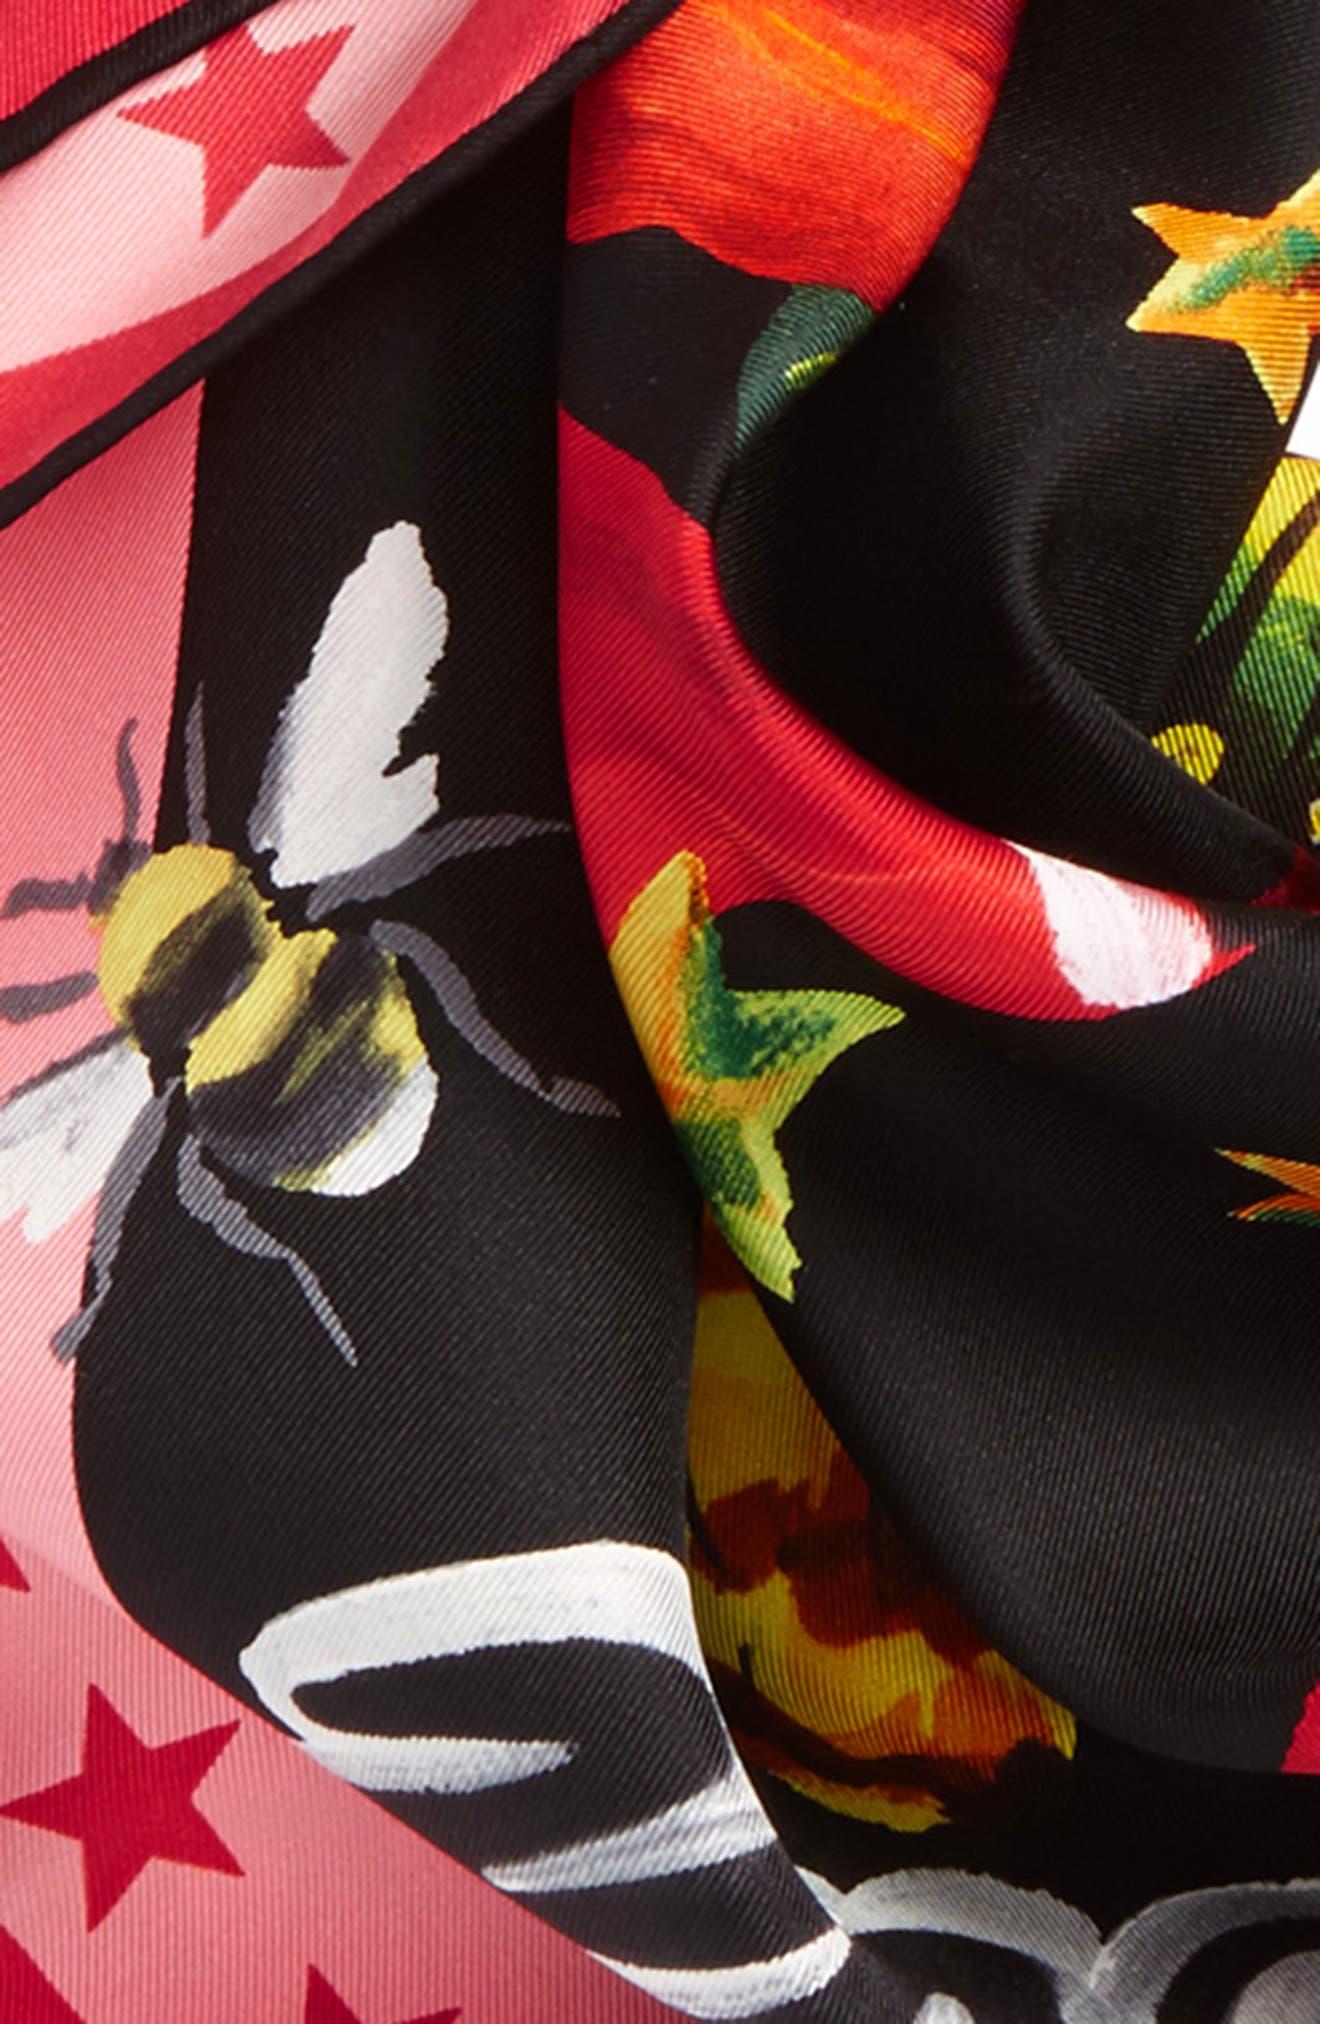 Foulard Jakam Silk Scarf,                             Alternate thumbnail 4, color,                             Black/ Pink